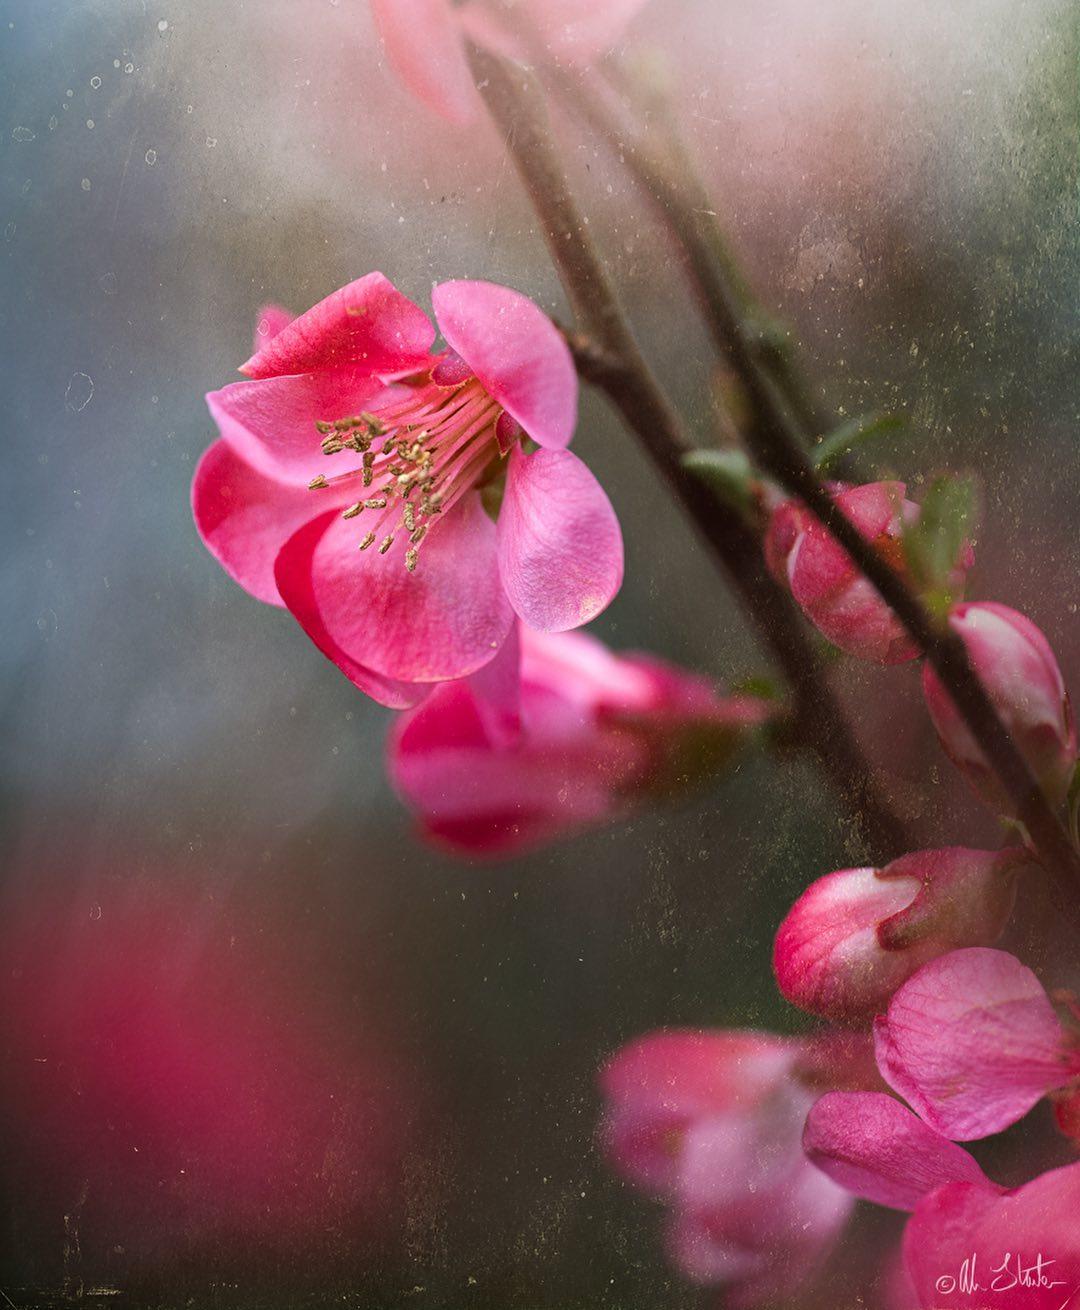 Красота цветов на снимках Элисон Стэйт